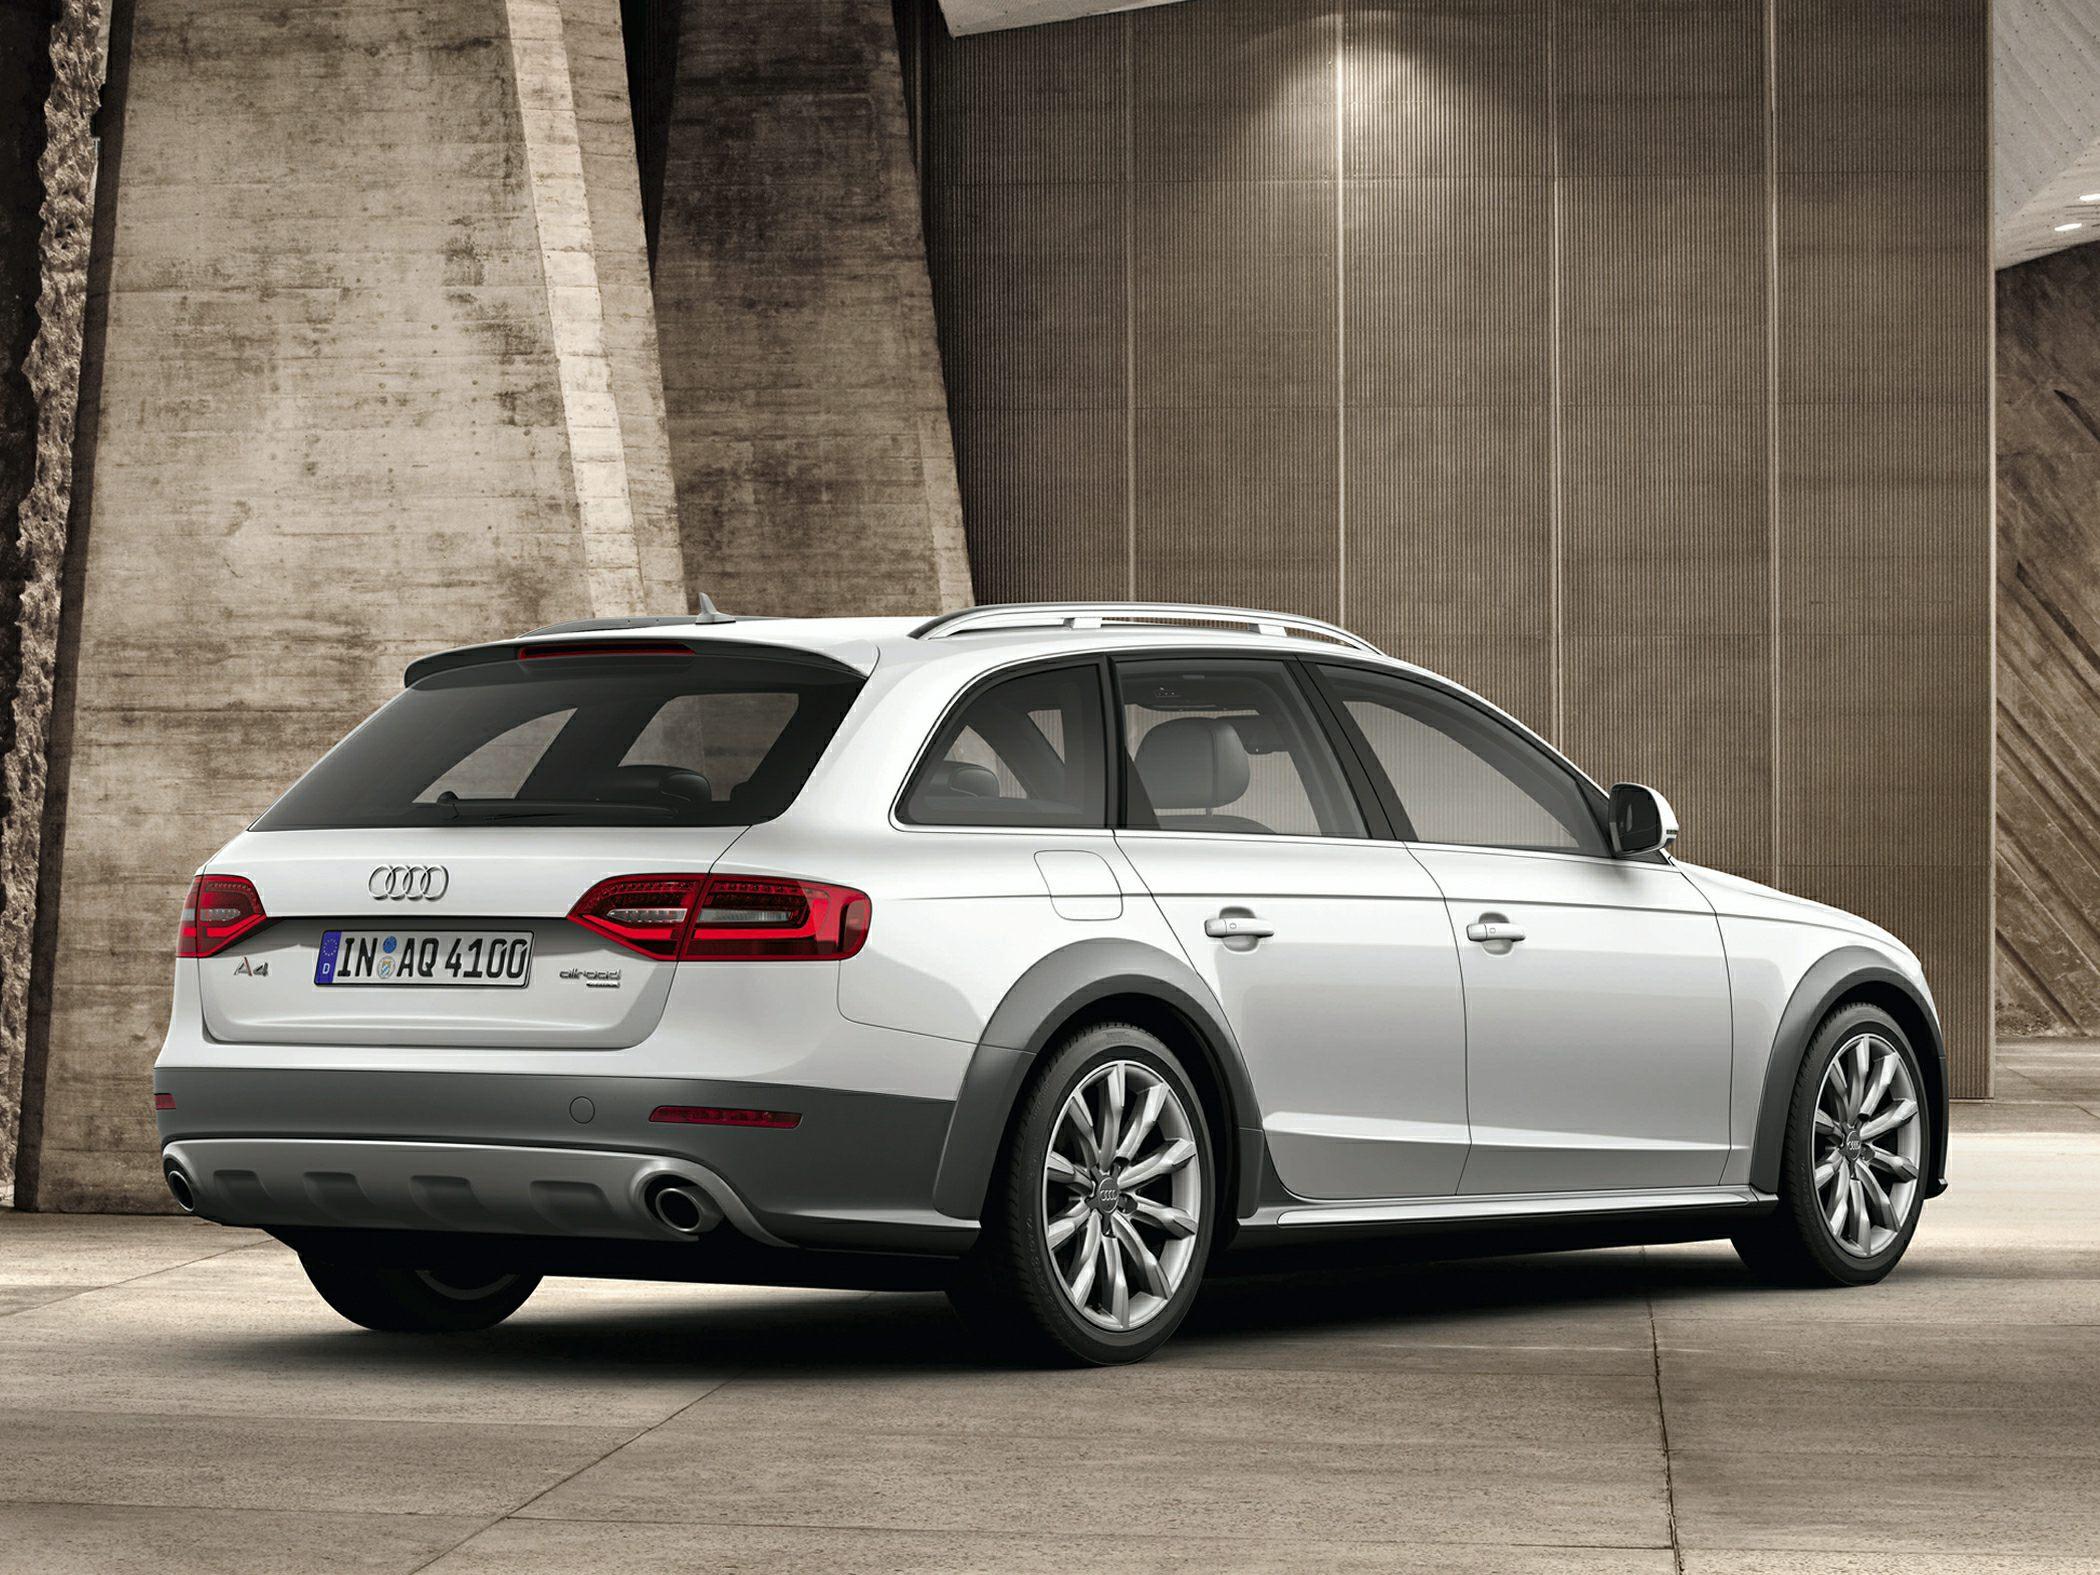 2014 Audi allroad Glam